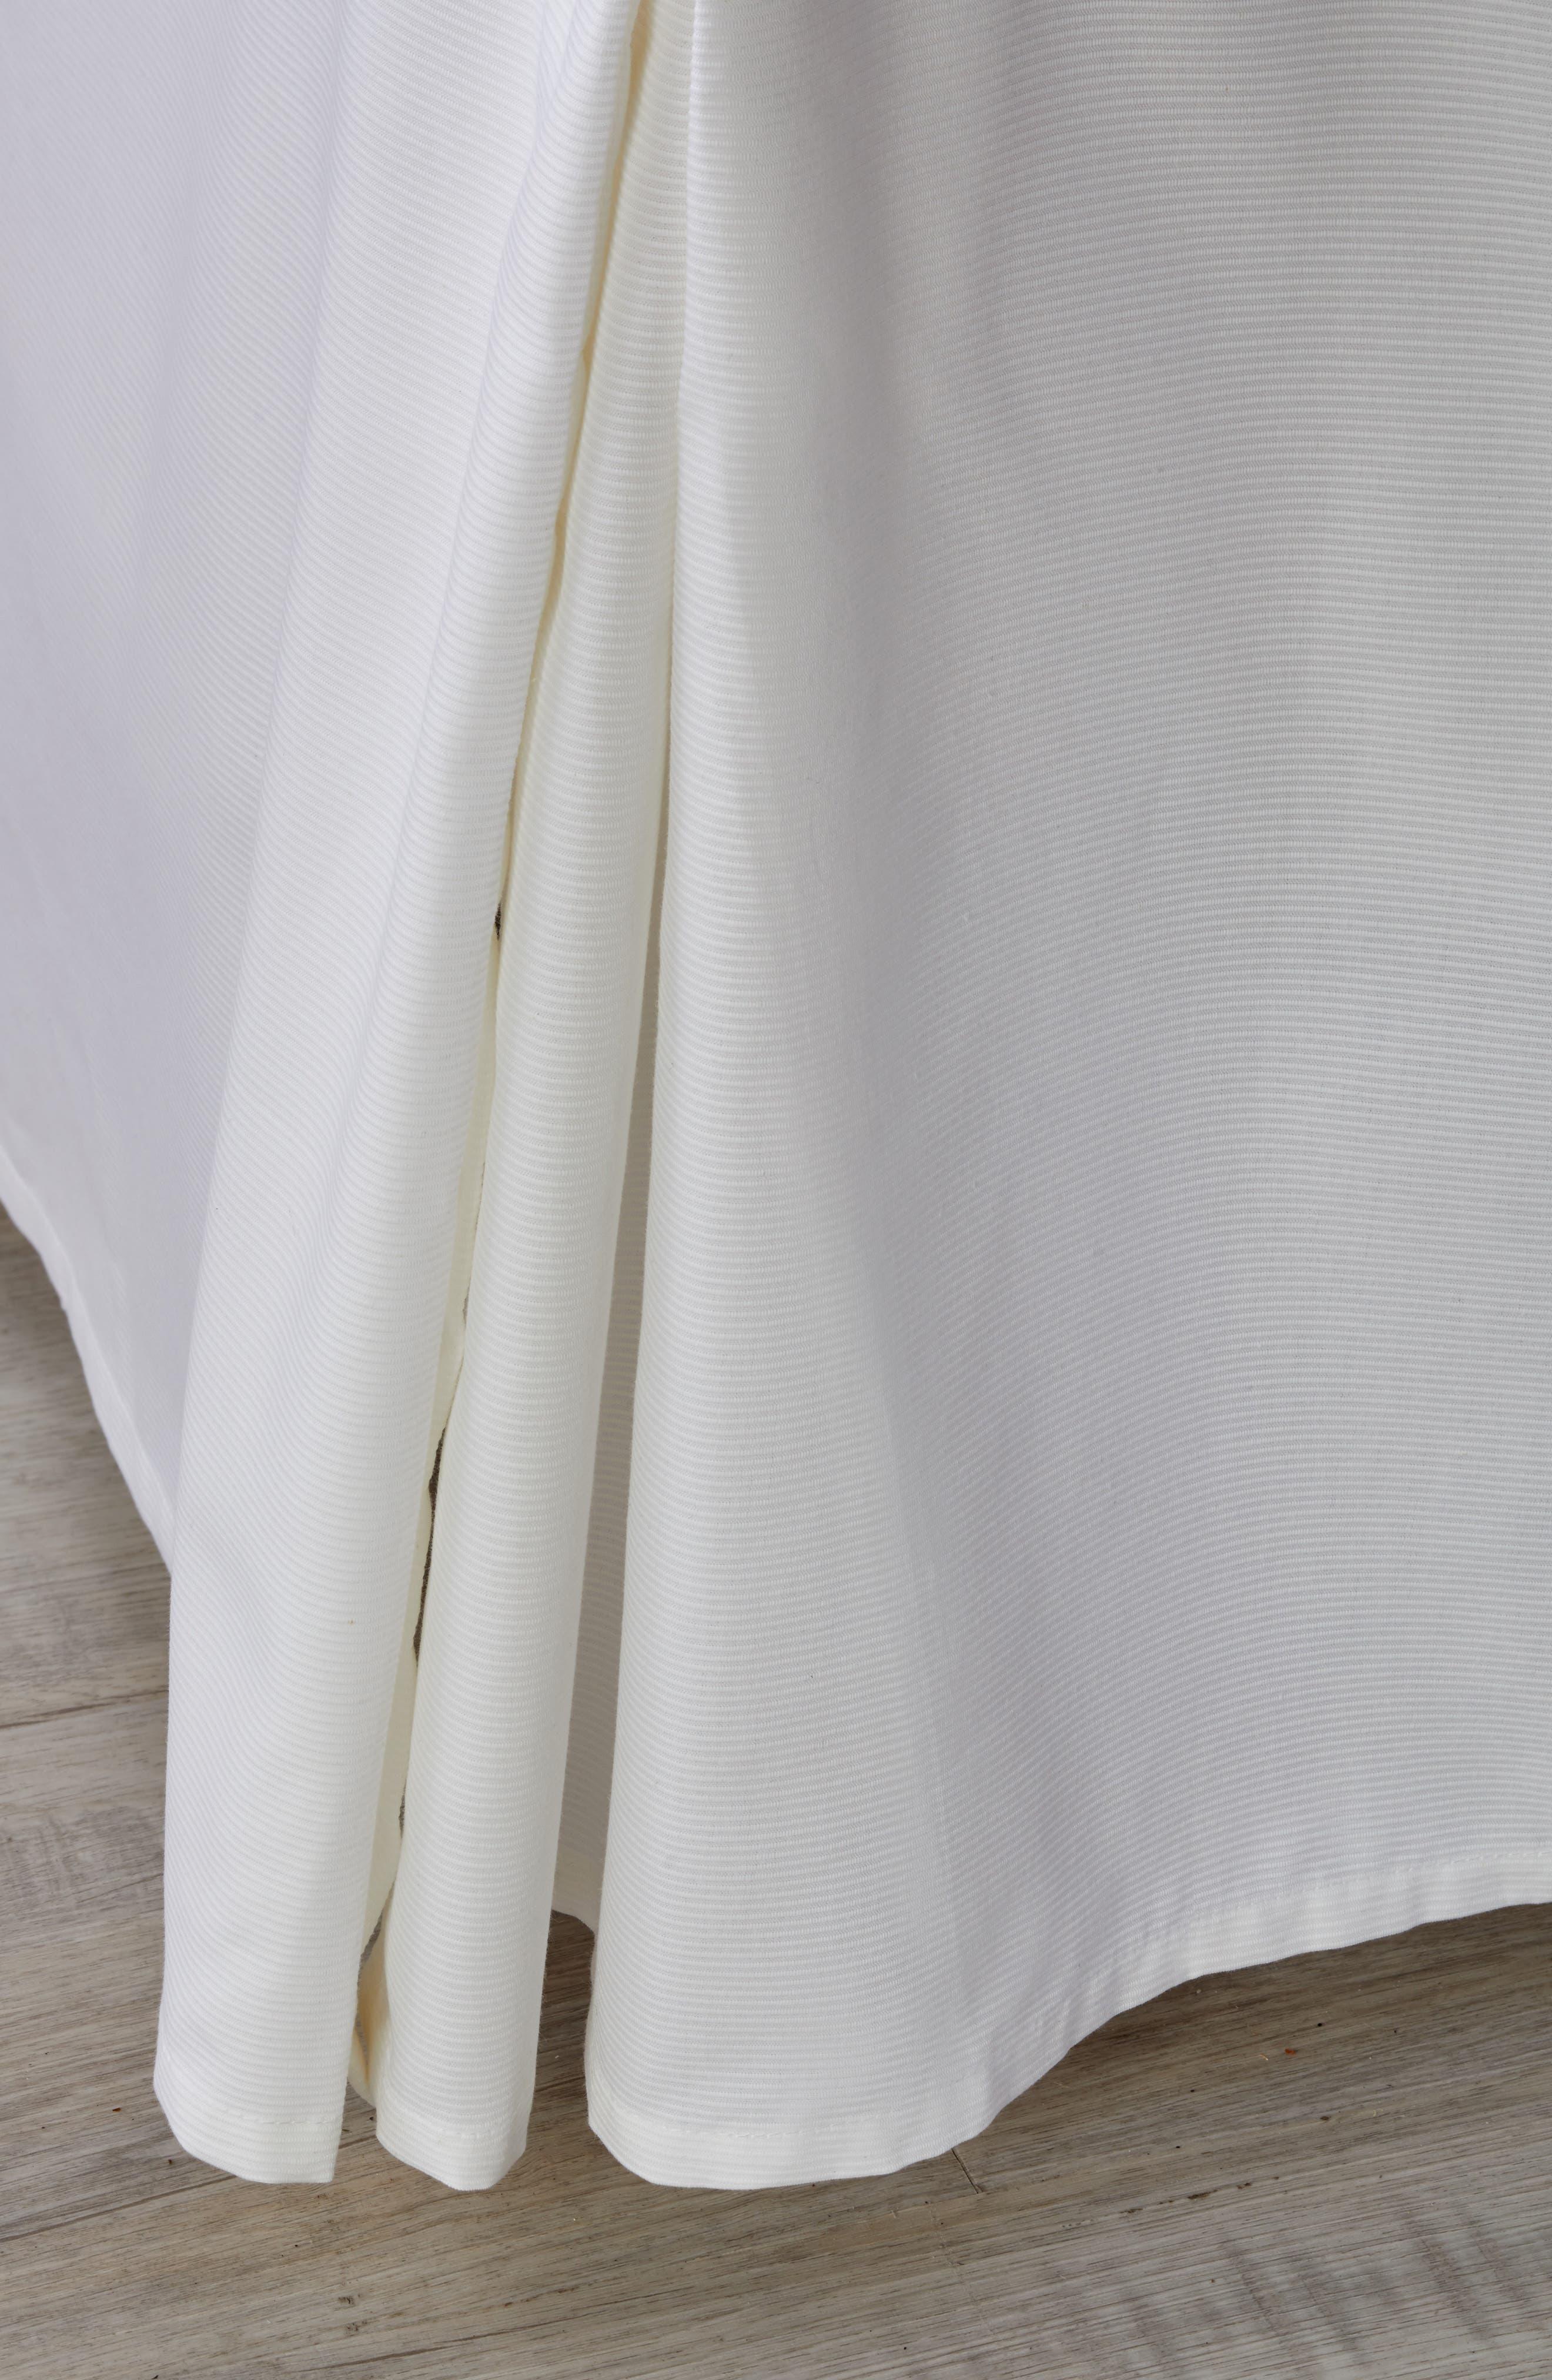 Woven Rib Bed Skirt,                         Main,                         color, 100